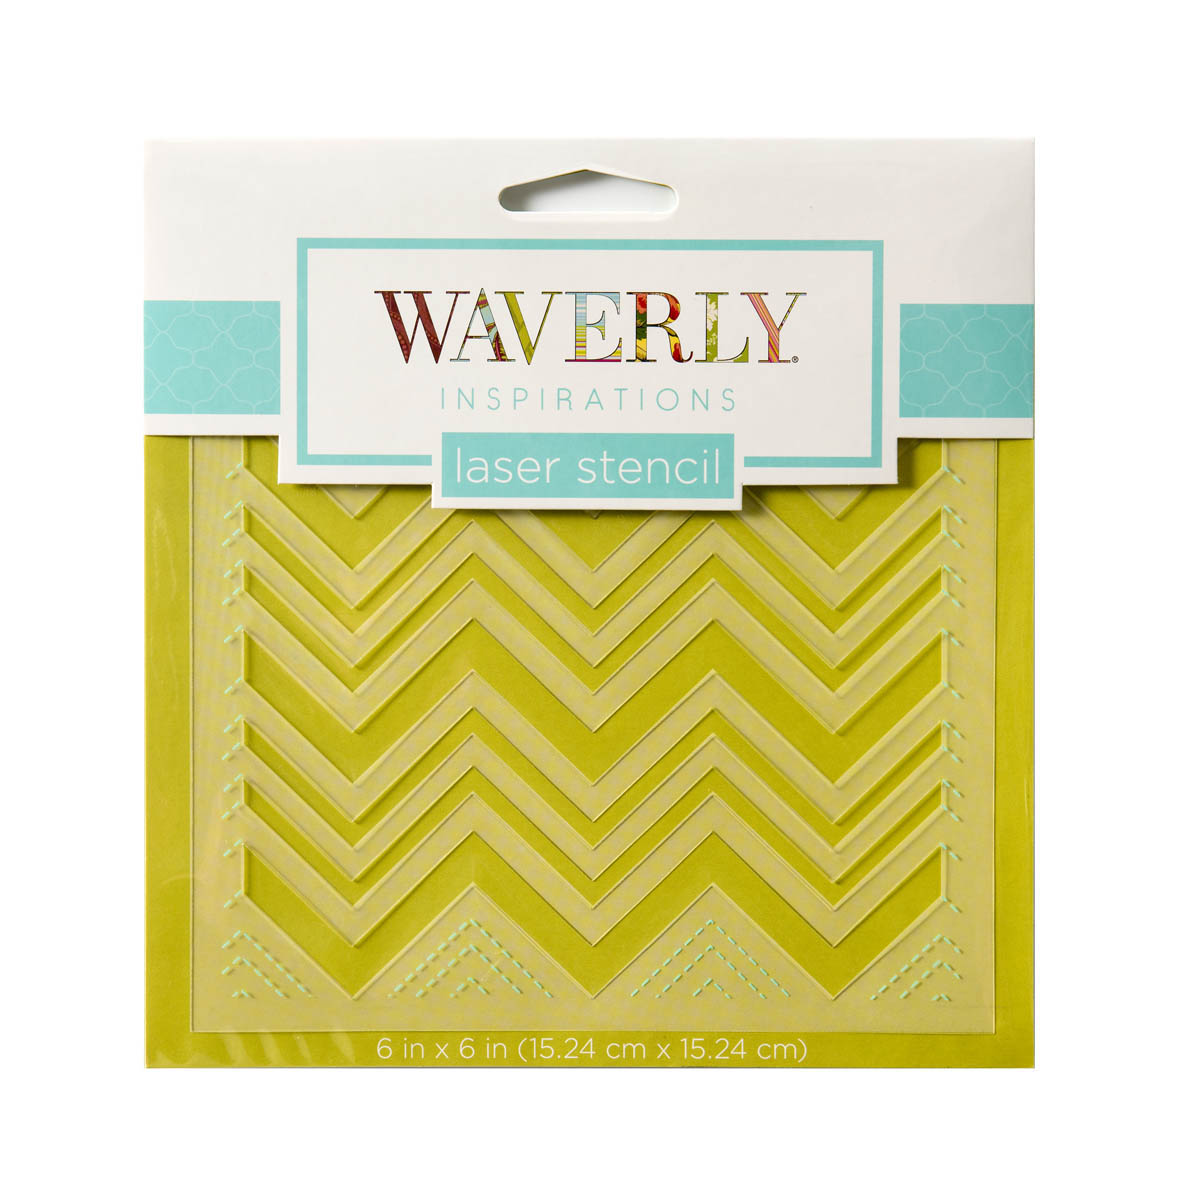 Waverly ® Inspirations Laser Stencils - Accent - Chevron, 6